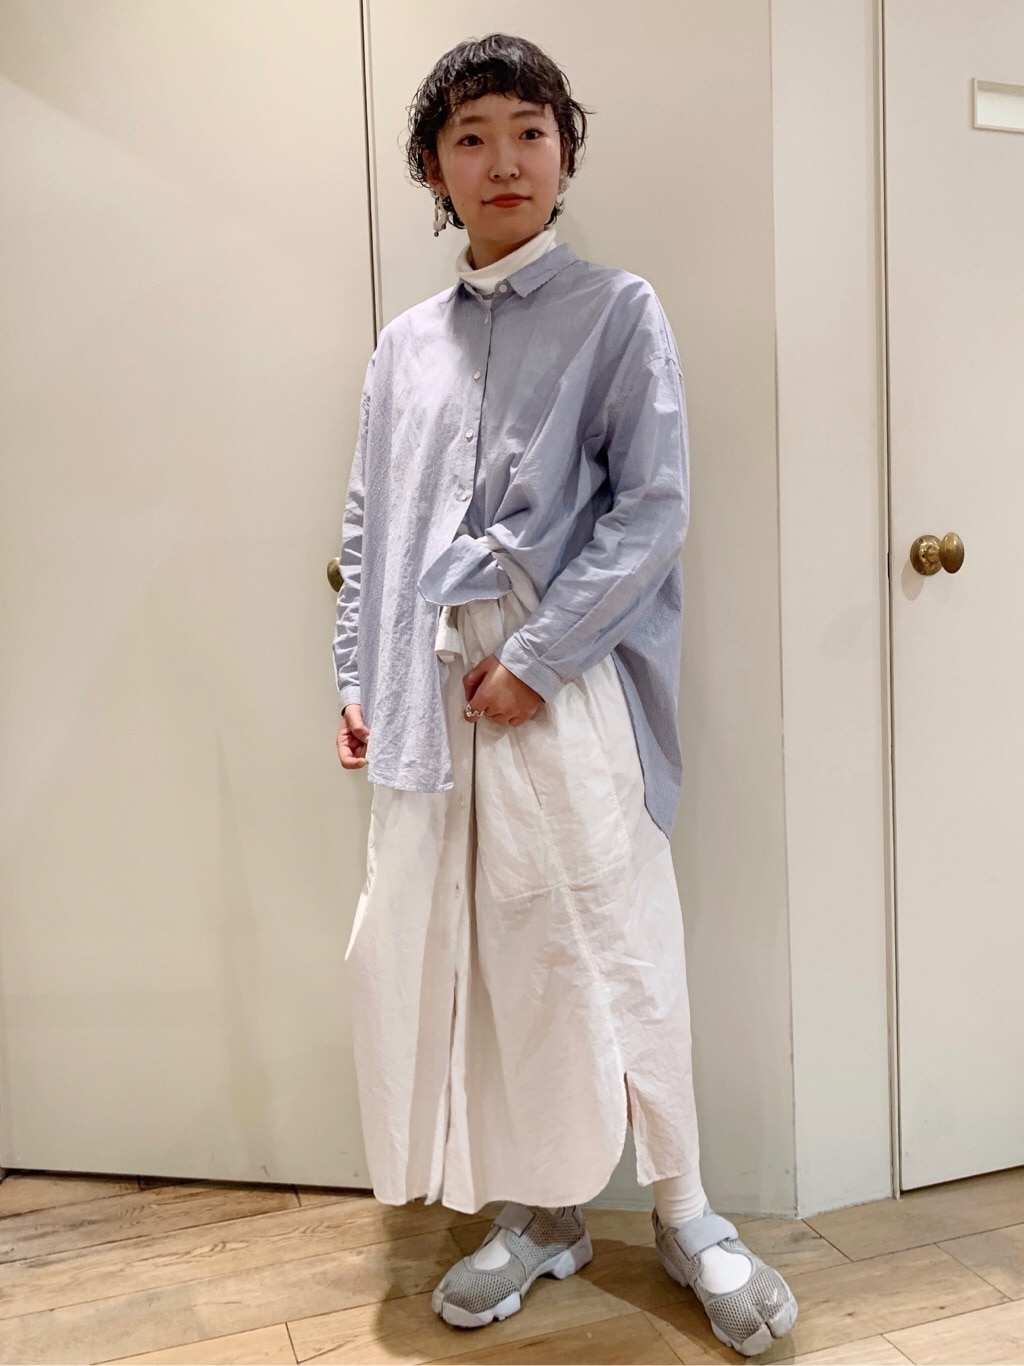 bulle de savon 新宿ミロード 身長:159cm 2020.03.17